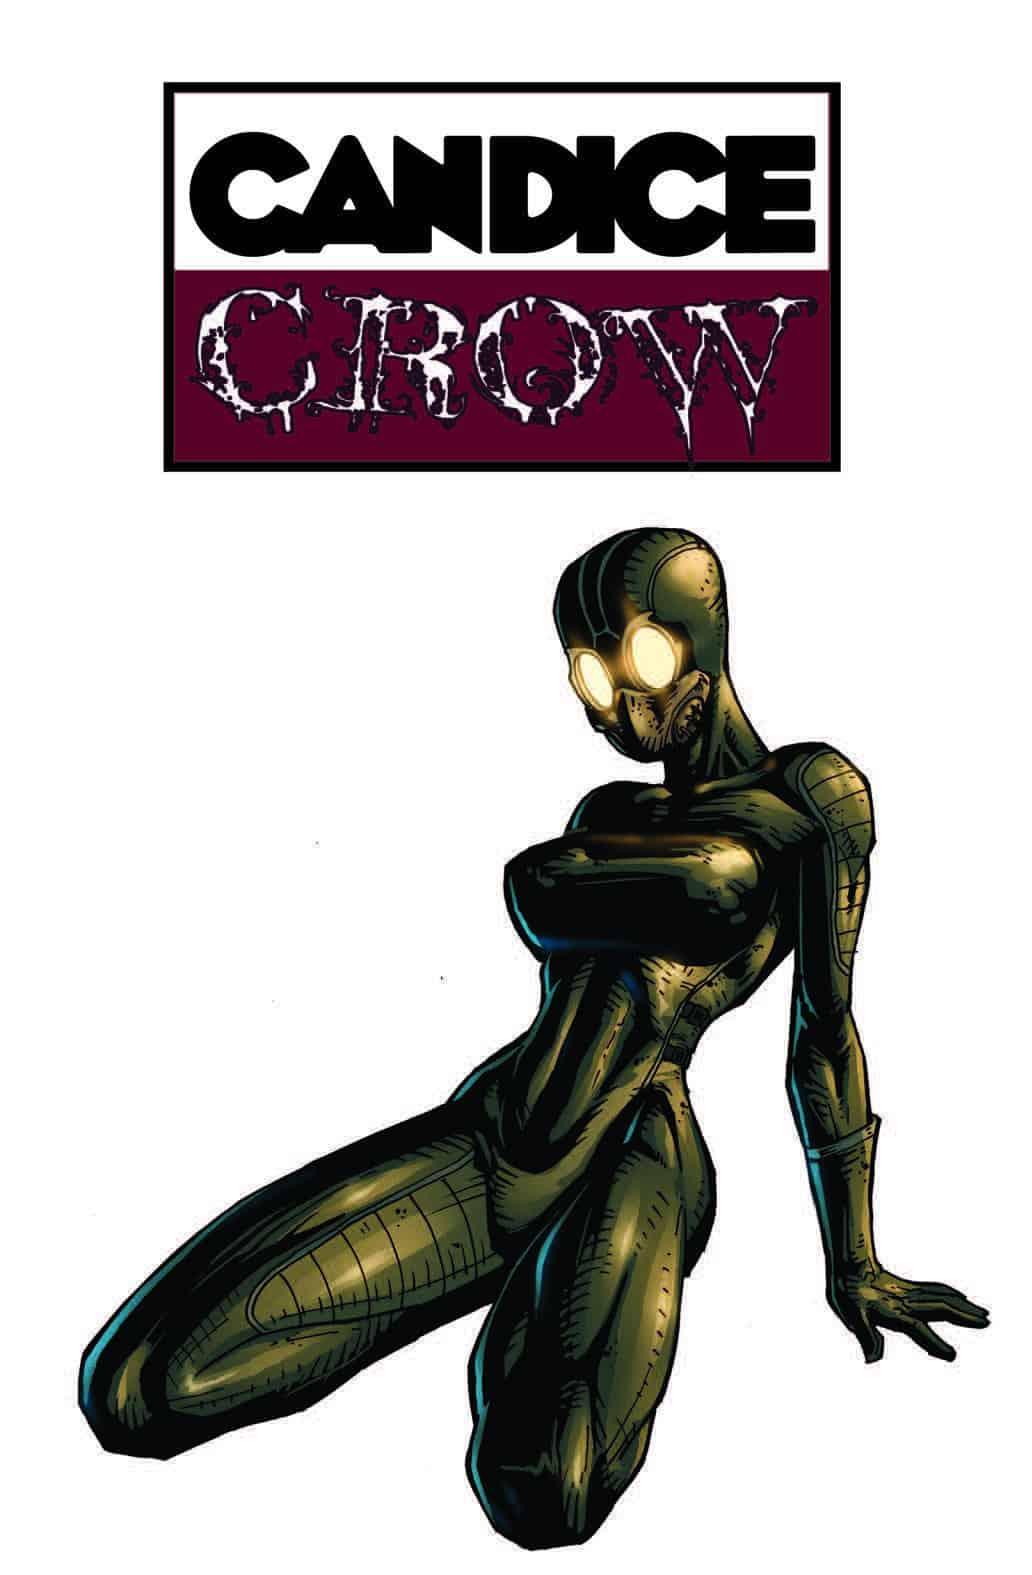 Candice Crow 2